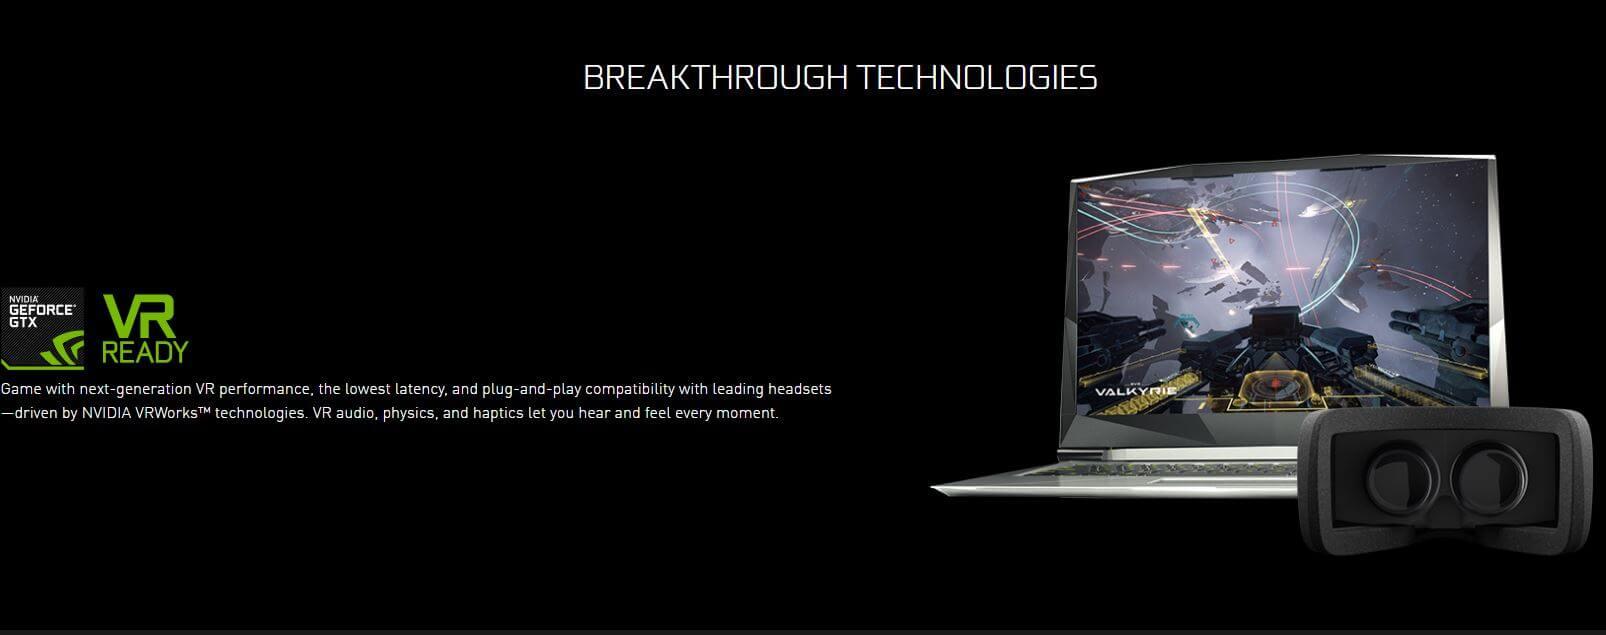 htc vive oculus rift laptop